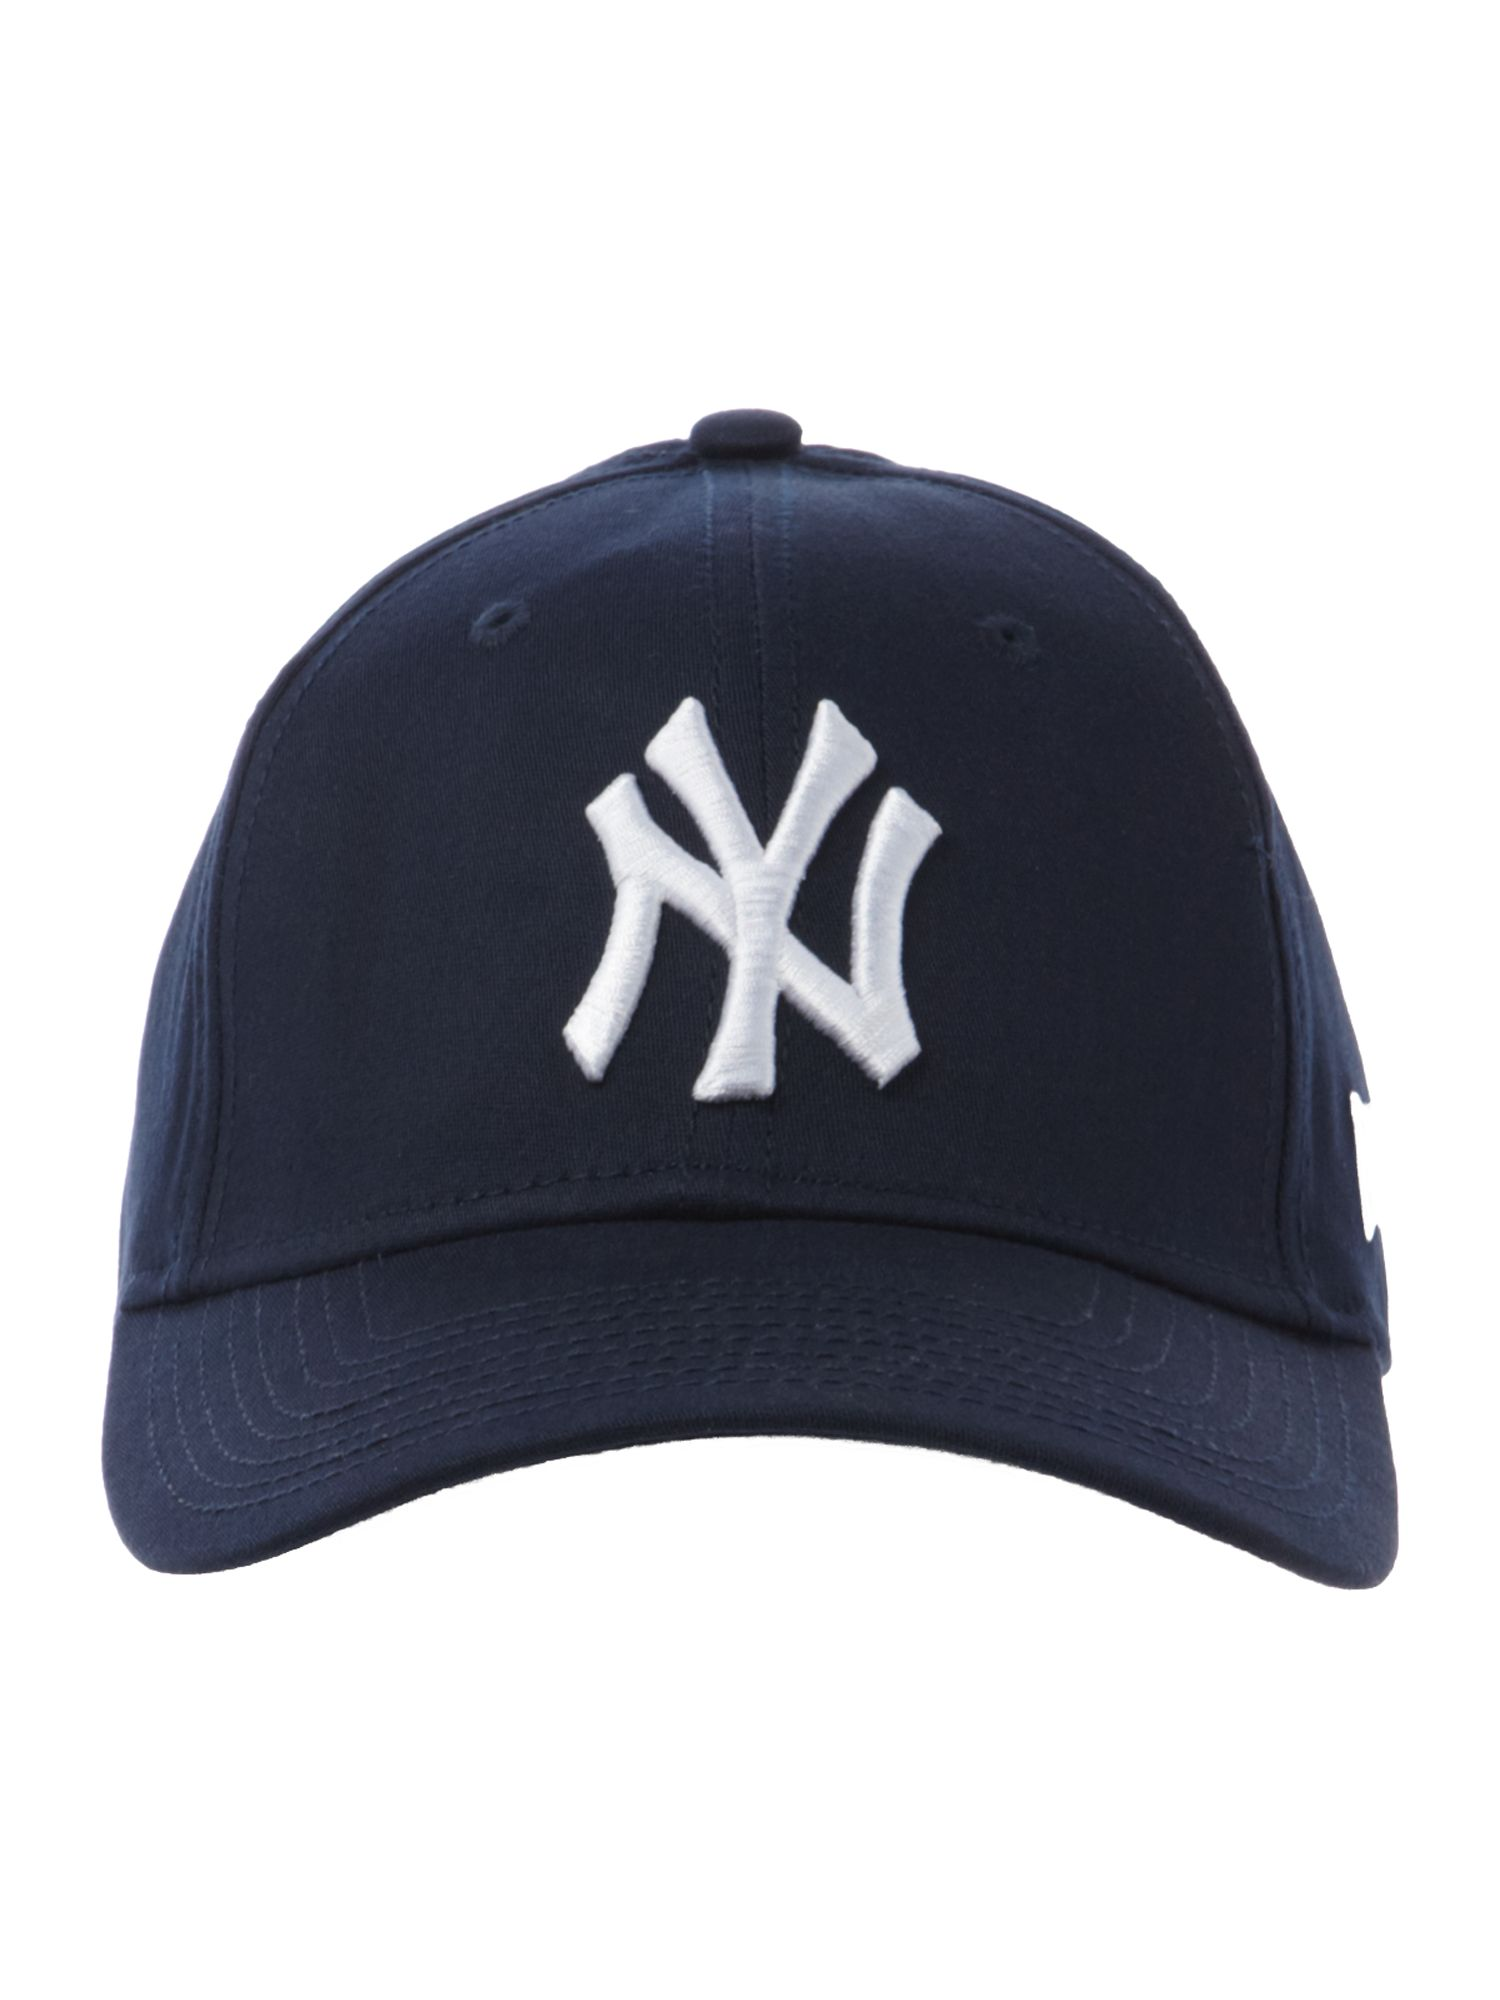 New York Yankees Hat Navy Blue